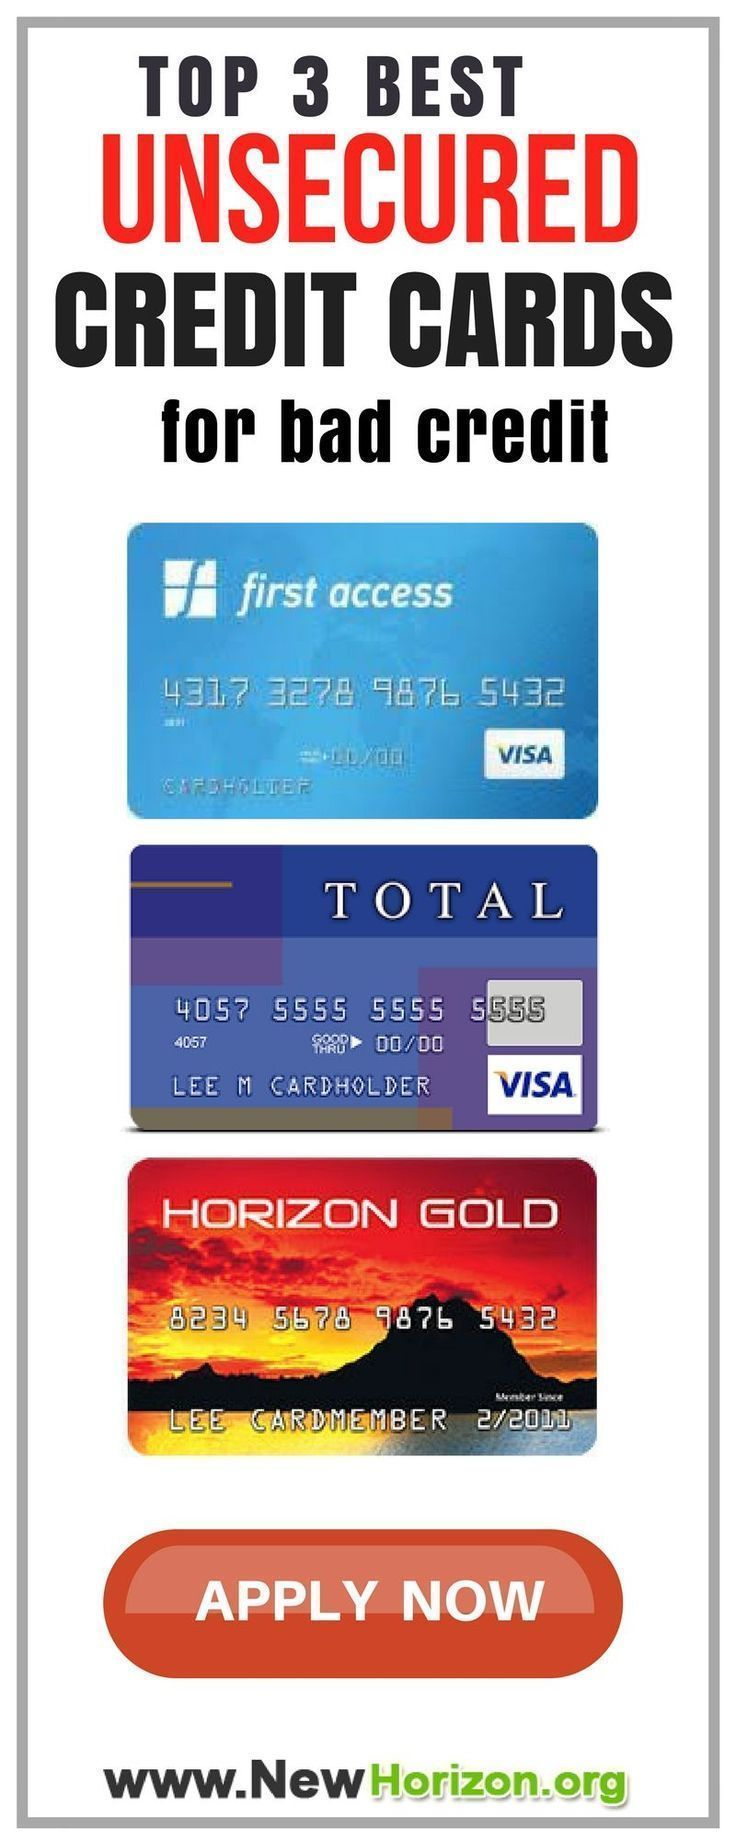 Credit Card Wallpaper Beste Kreditkarte Kreditkarte Beste